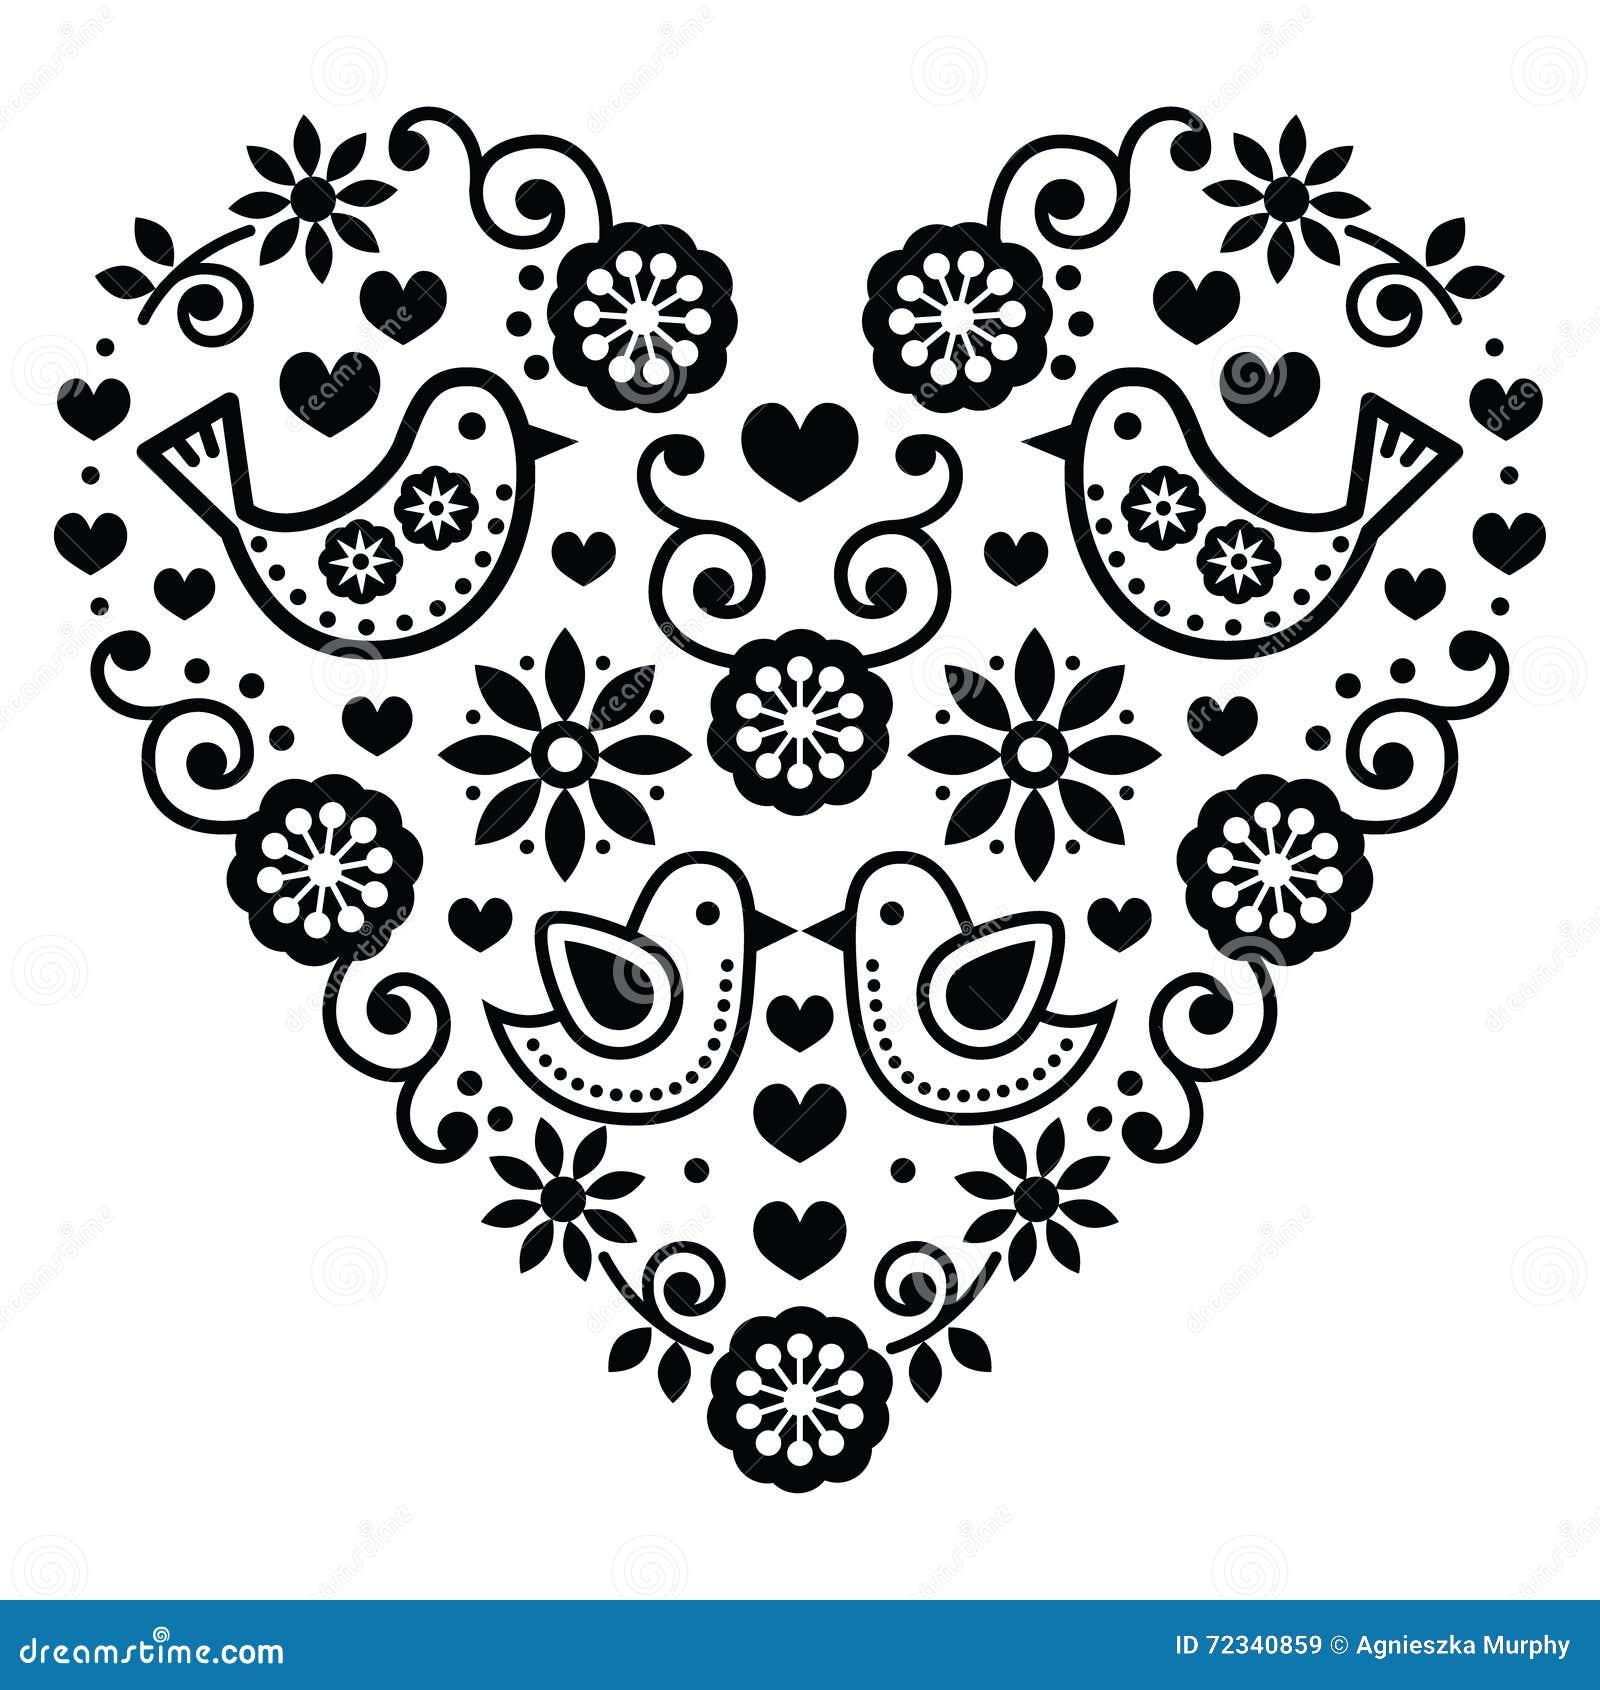 ... art Valentine s Day heart - love, wedding, birthday greetings card